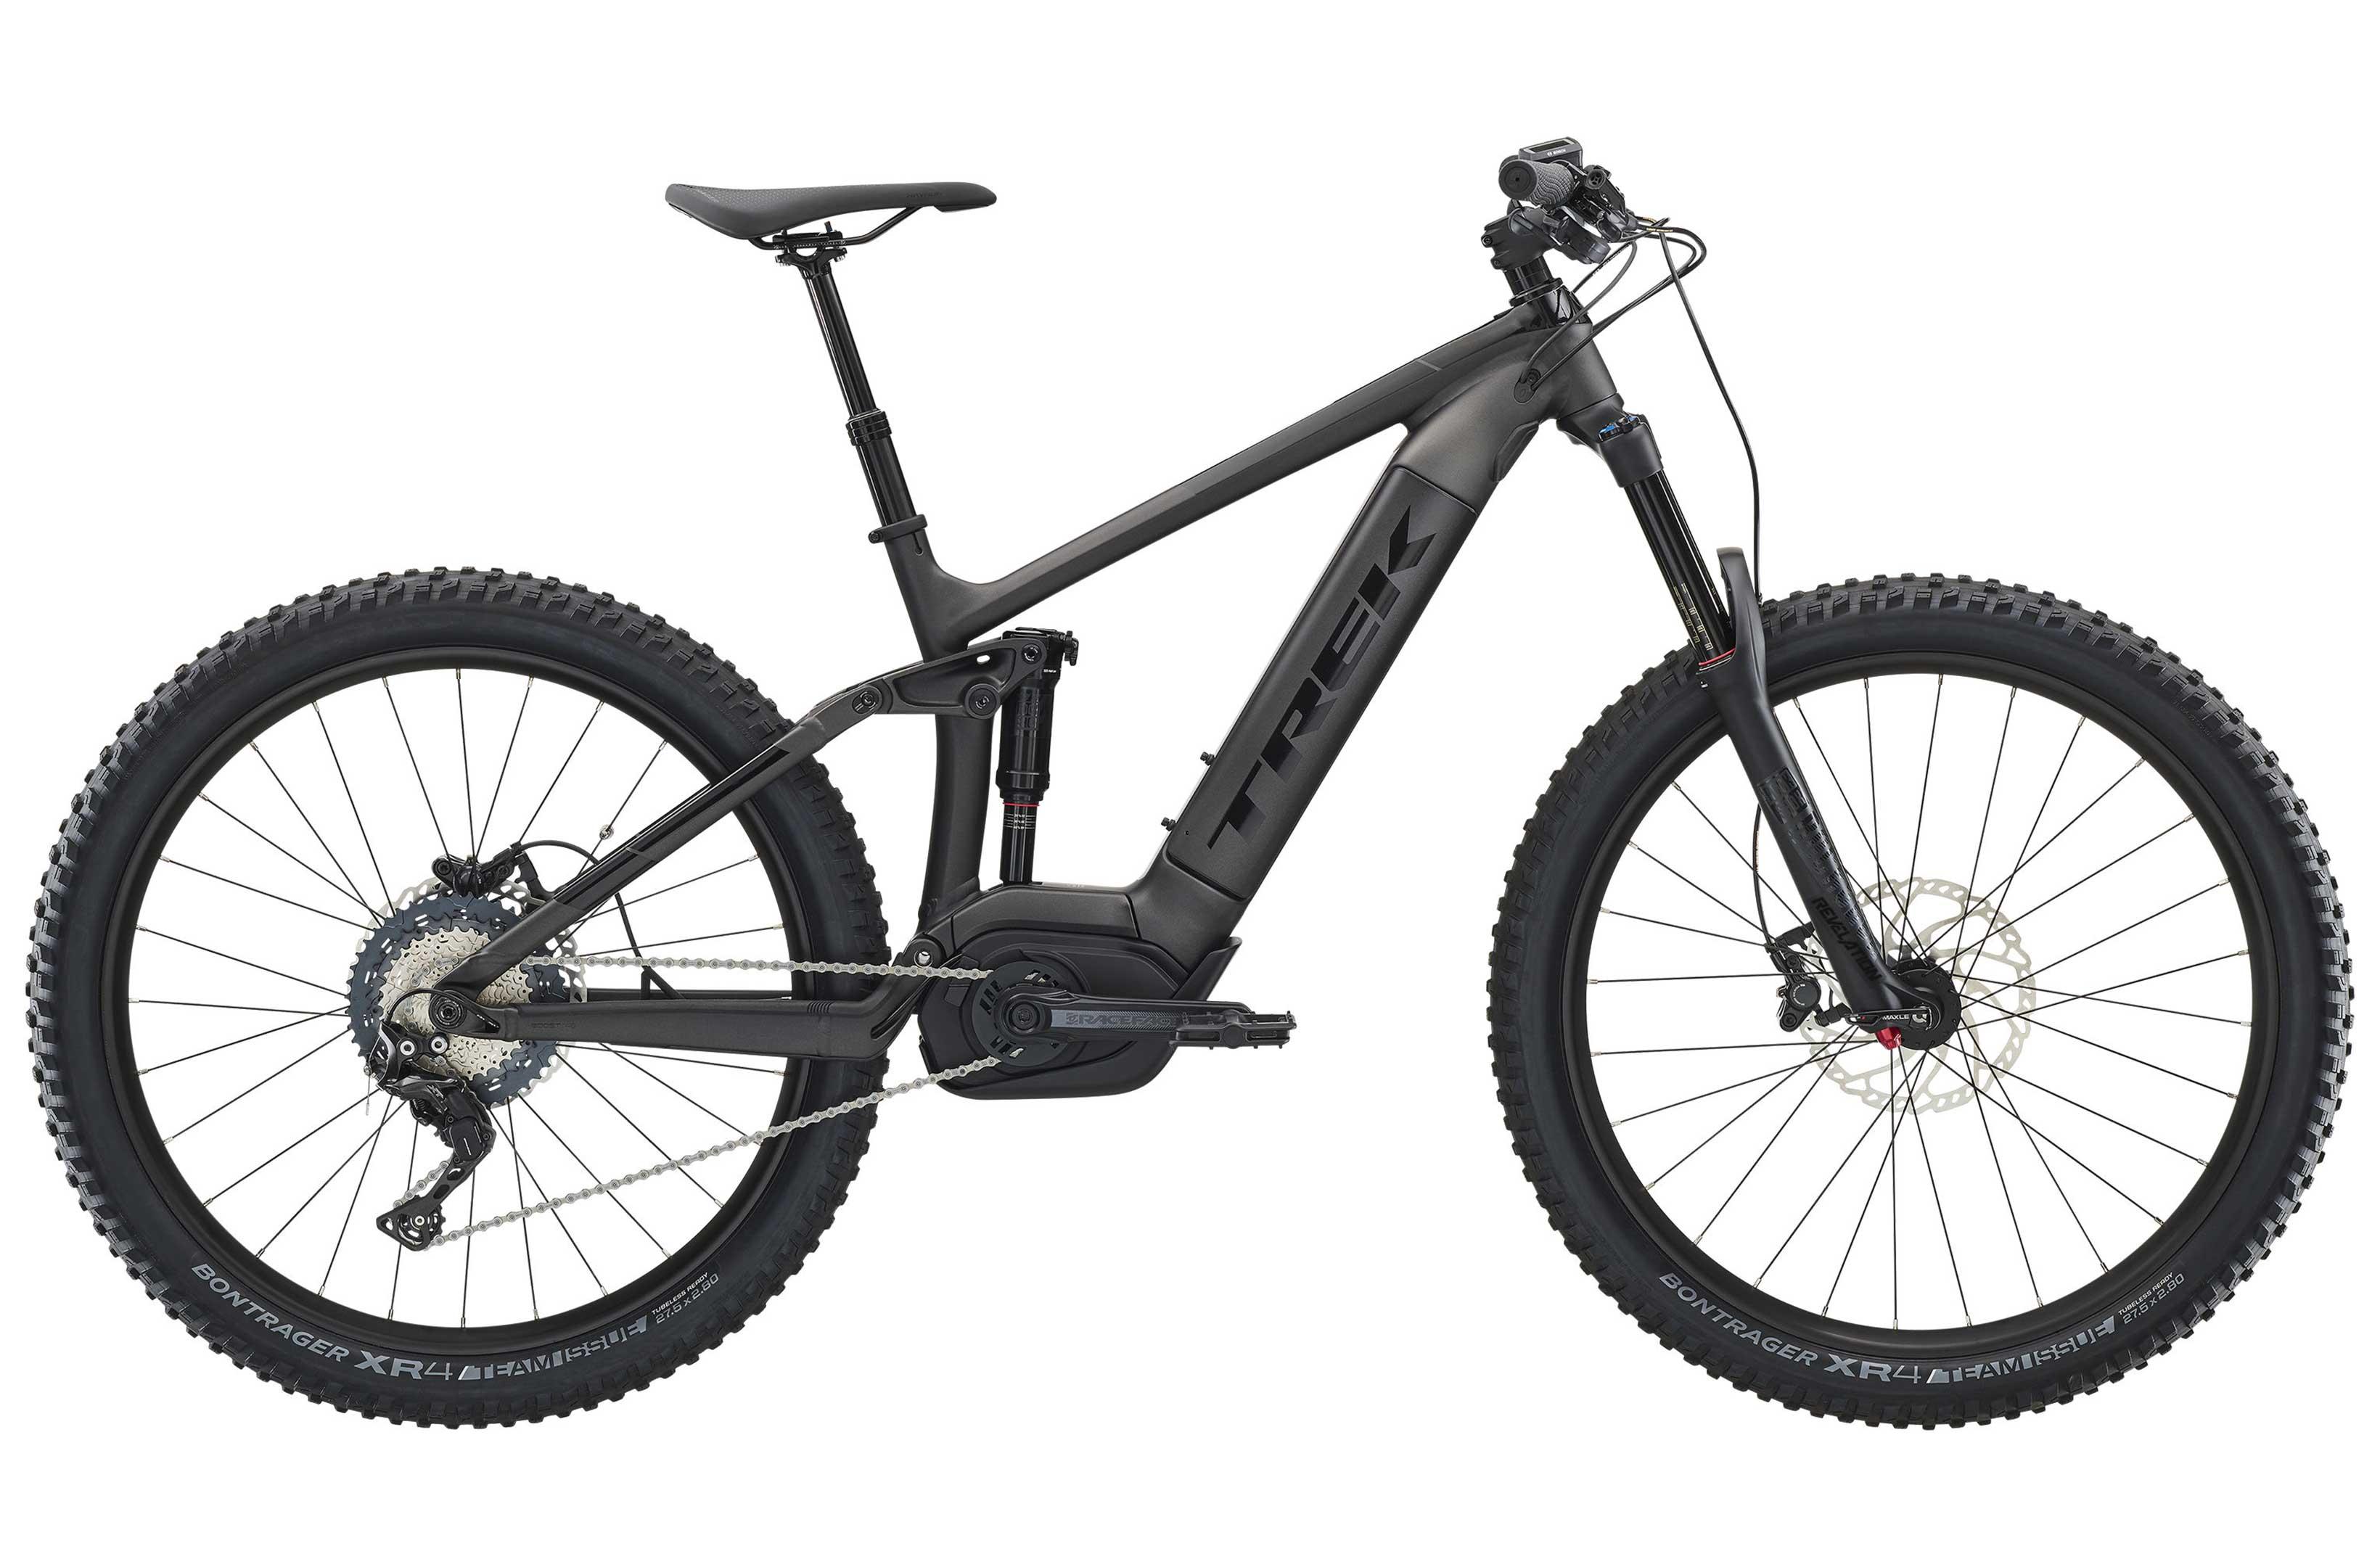 Trek Powerfly FS 7 2019 Electric Mountain Bike (Black, 19.5 Inch)